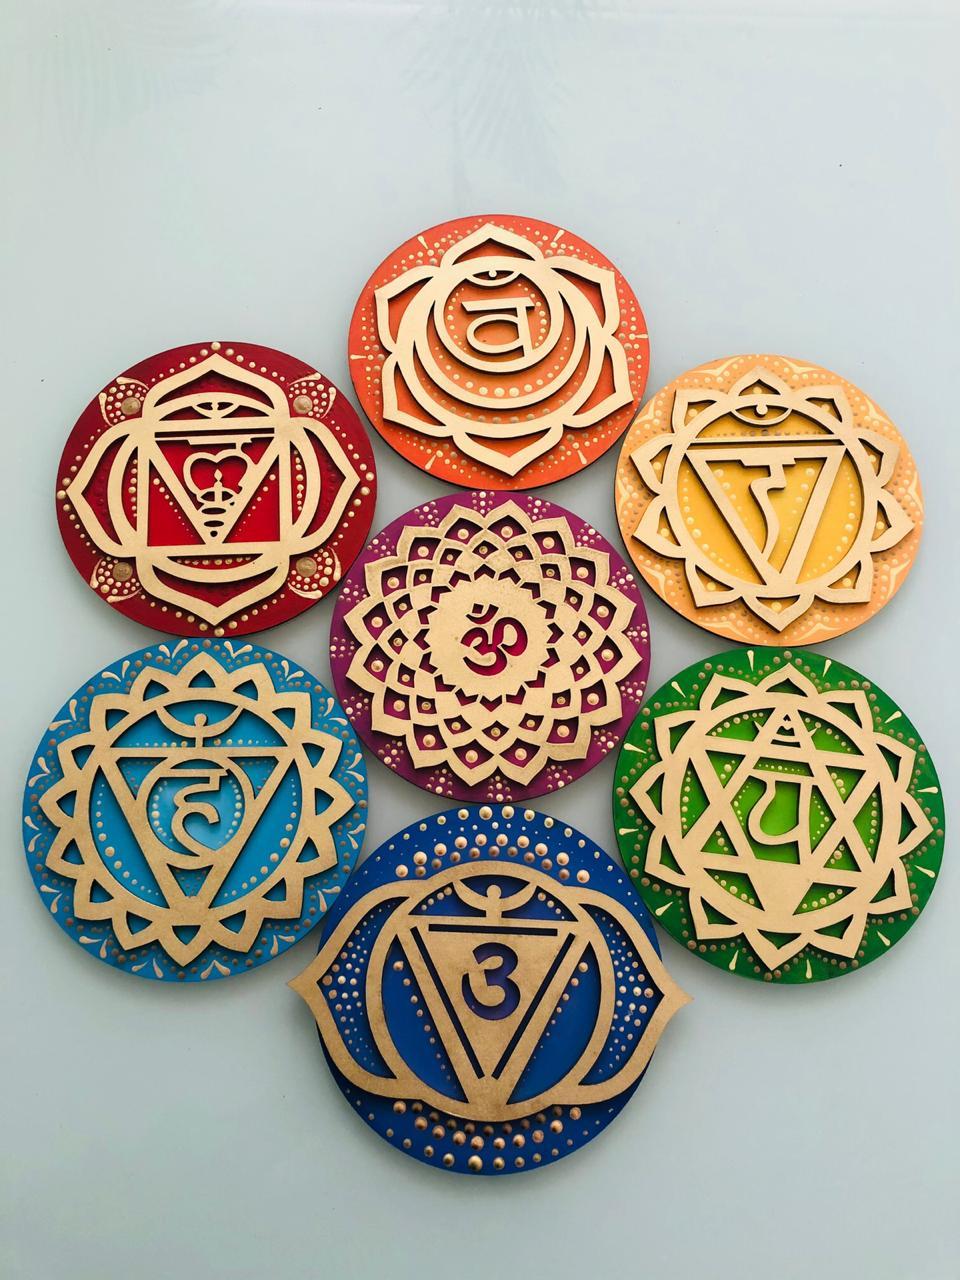 set-7-chakras-joya-artesanal-mexico-BOA131-armonizadores-geometria